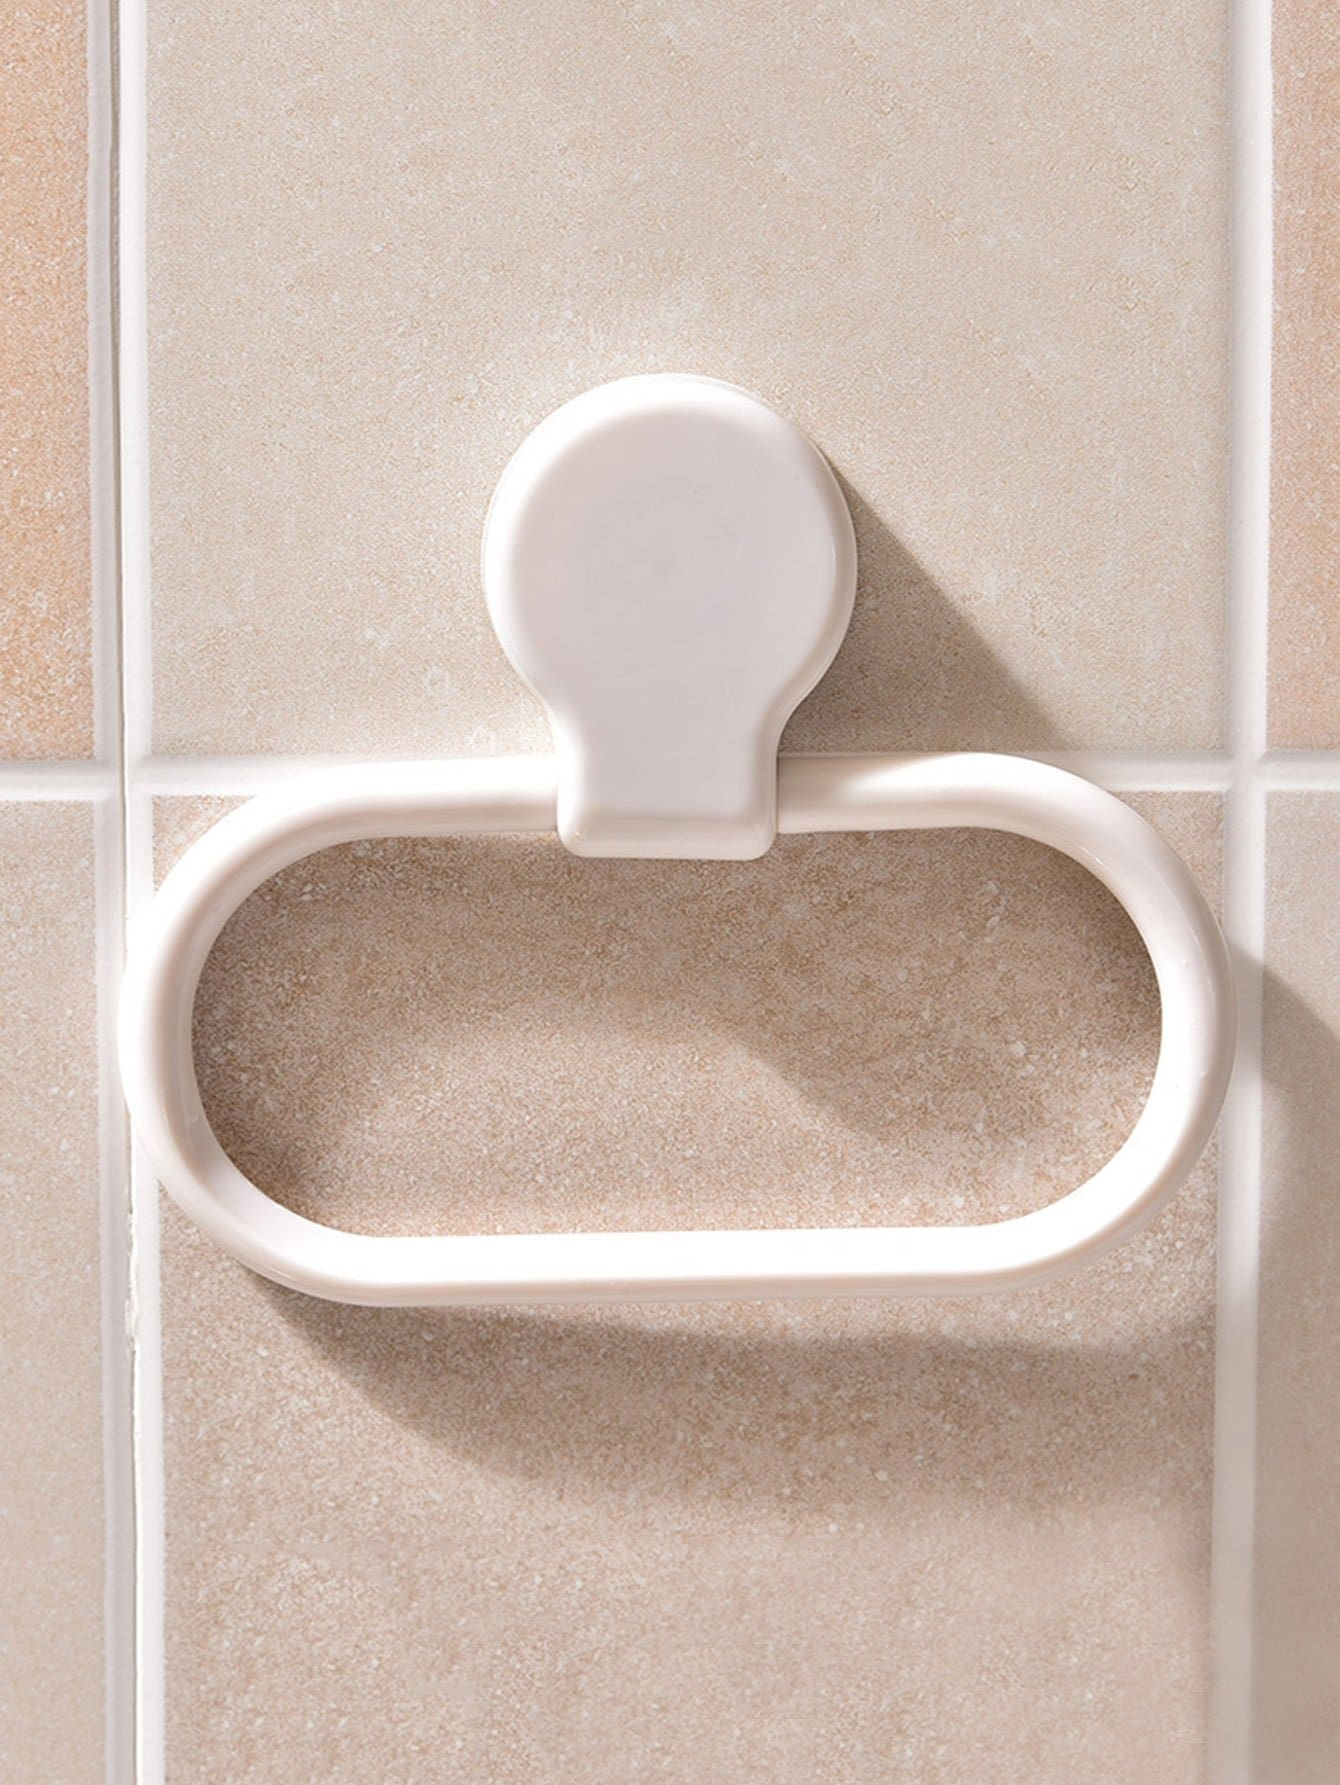 Wall Mounted Towel Ring gappo 1set wall mounted 60cm single towel bars antiquities bathroom accessories towel holder hooks restroom towel rack g3601